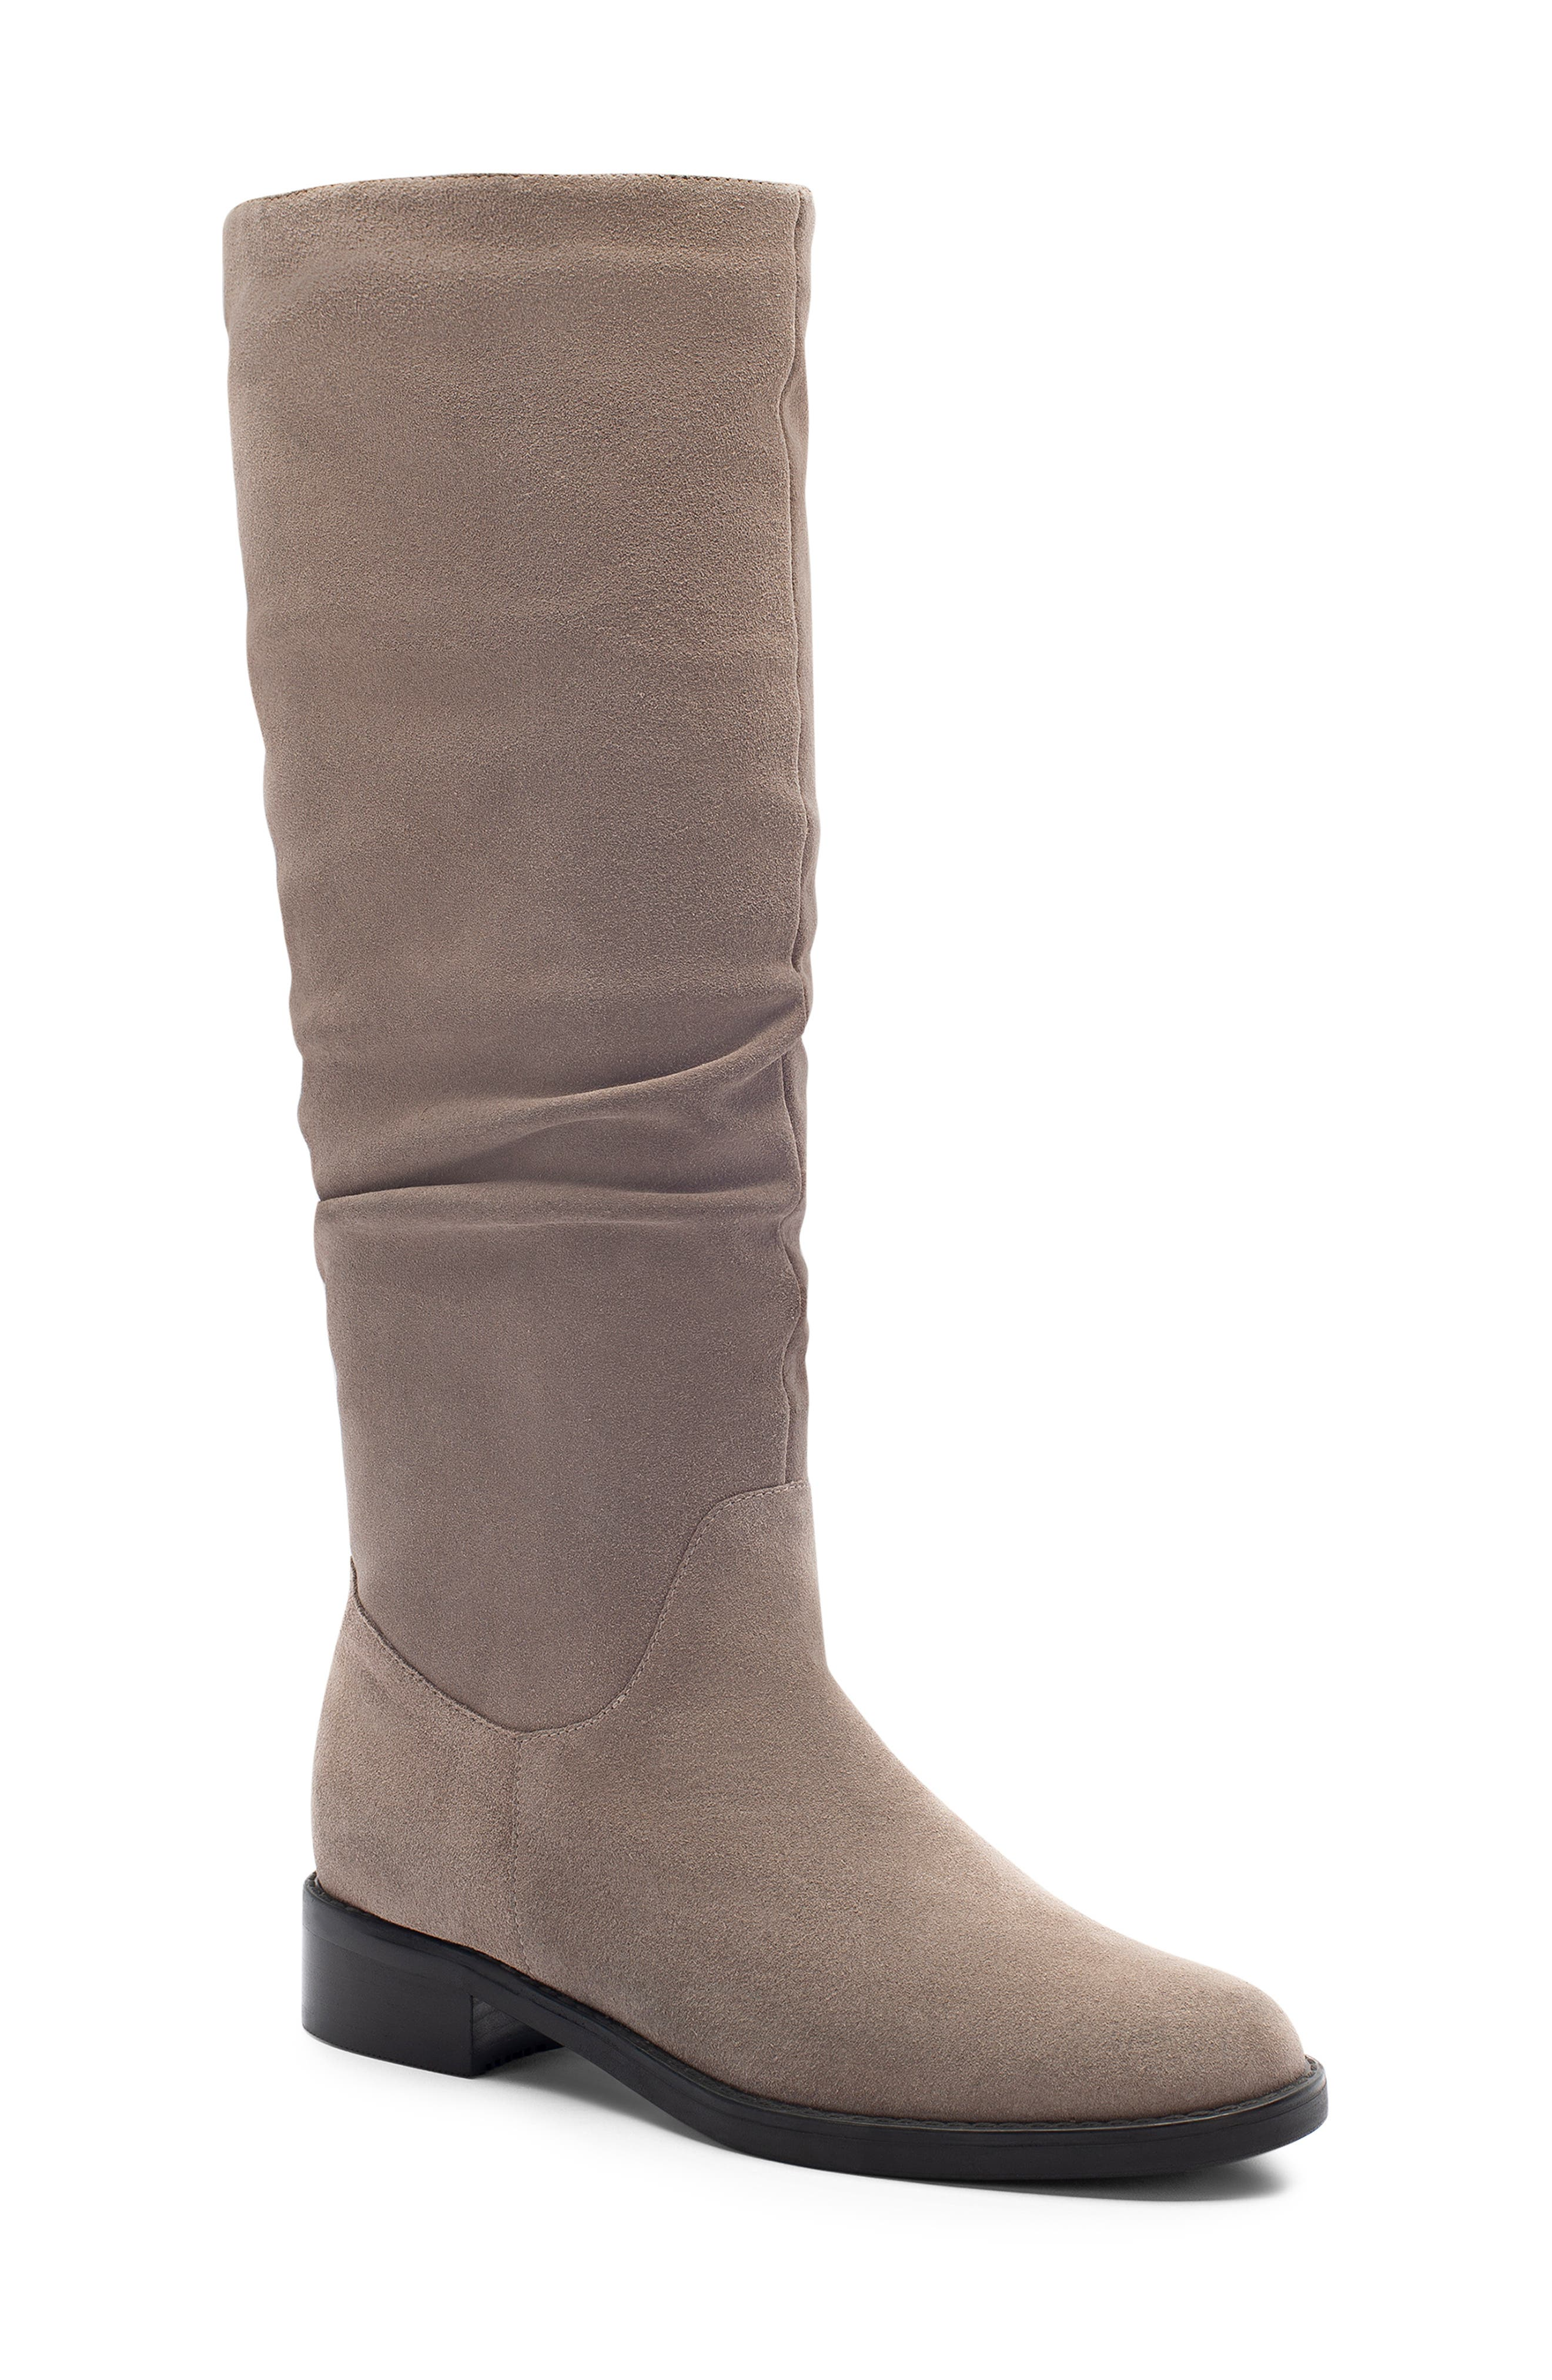 BLONDO Erika Waterproof Knee High Boot, Main, color, DARK TAUPE SUEDE